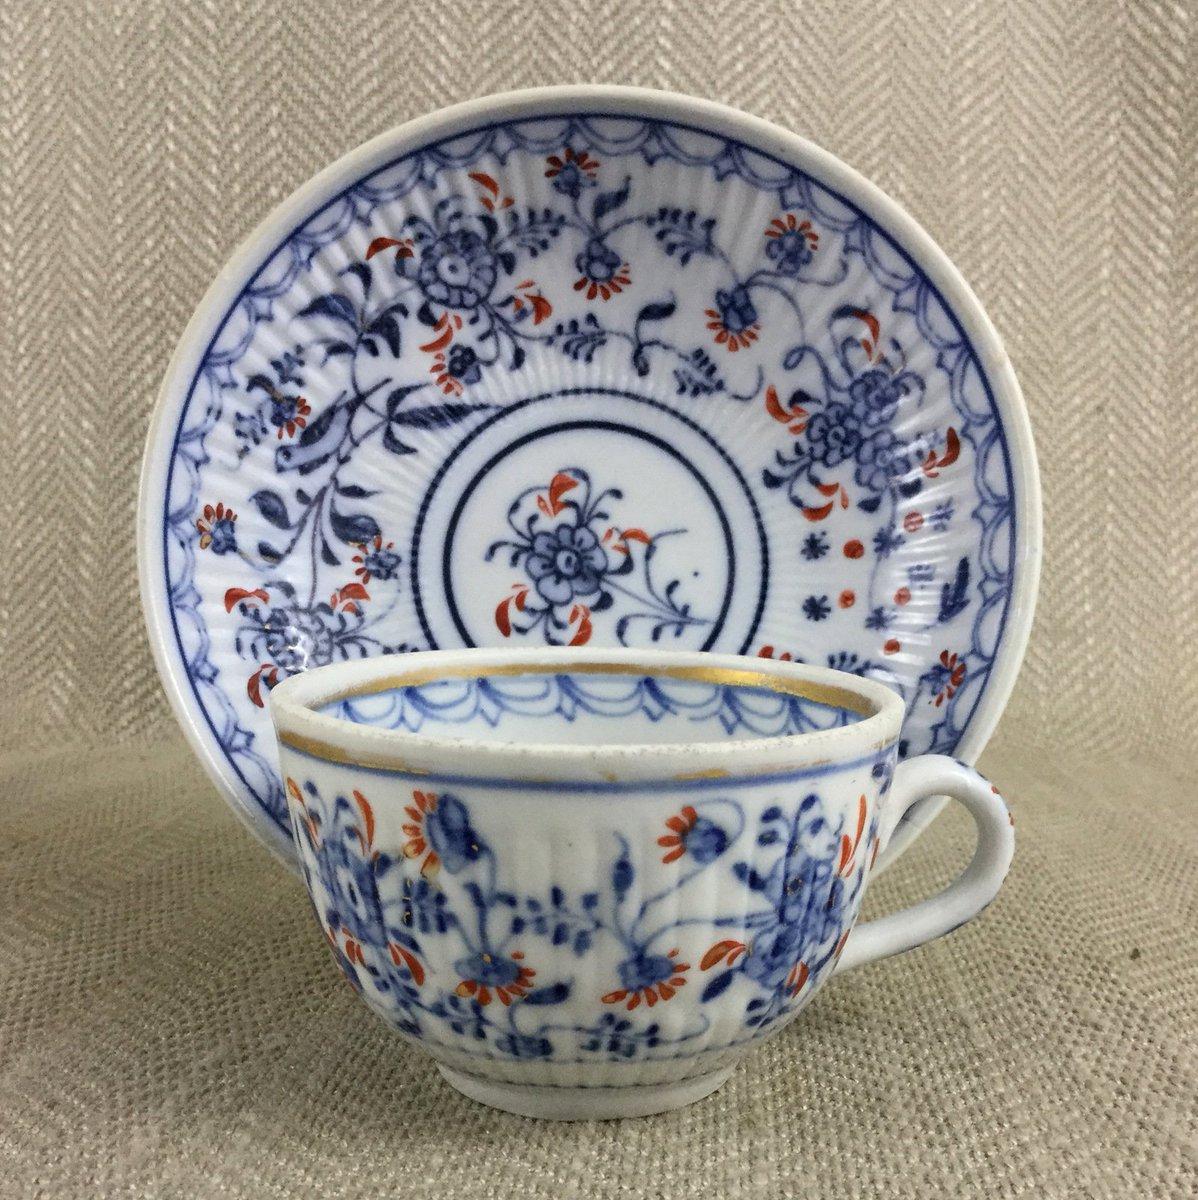 ANTIQUE TEACUP &amp; SAUCER DUO #Antique #Porcelain #HandPainted #vintage #teacups #kitchendecor #china  http:// ebay.eu/2lLbxDh  &nbsp;  <br>http://pic.twitter.com/FCe9BVUz1W